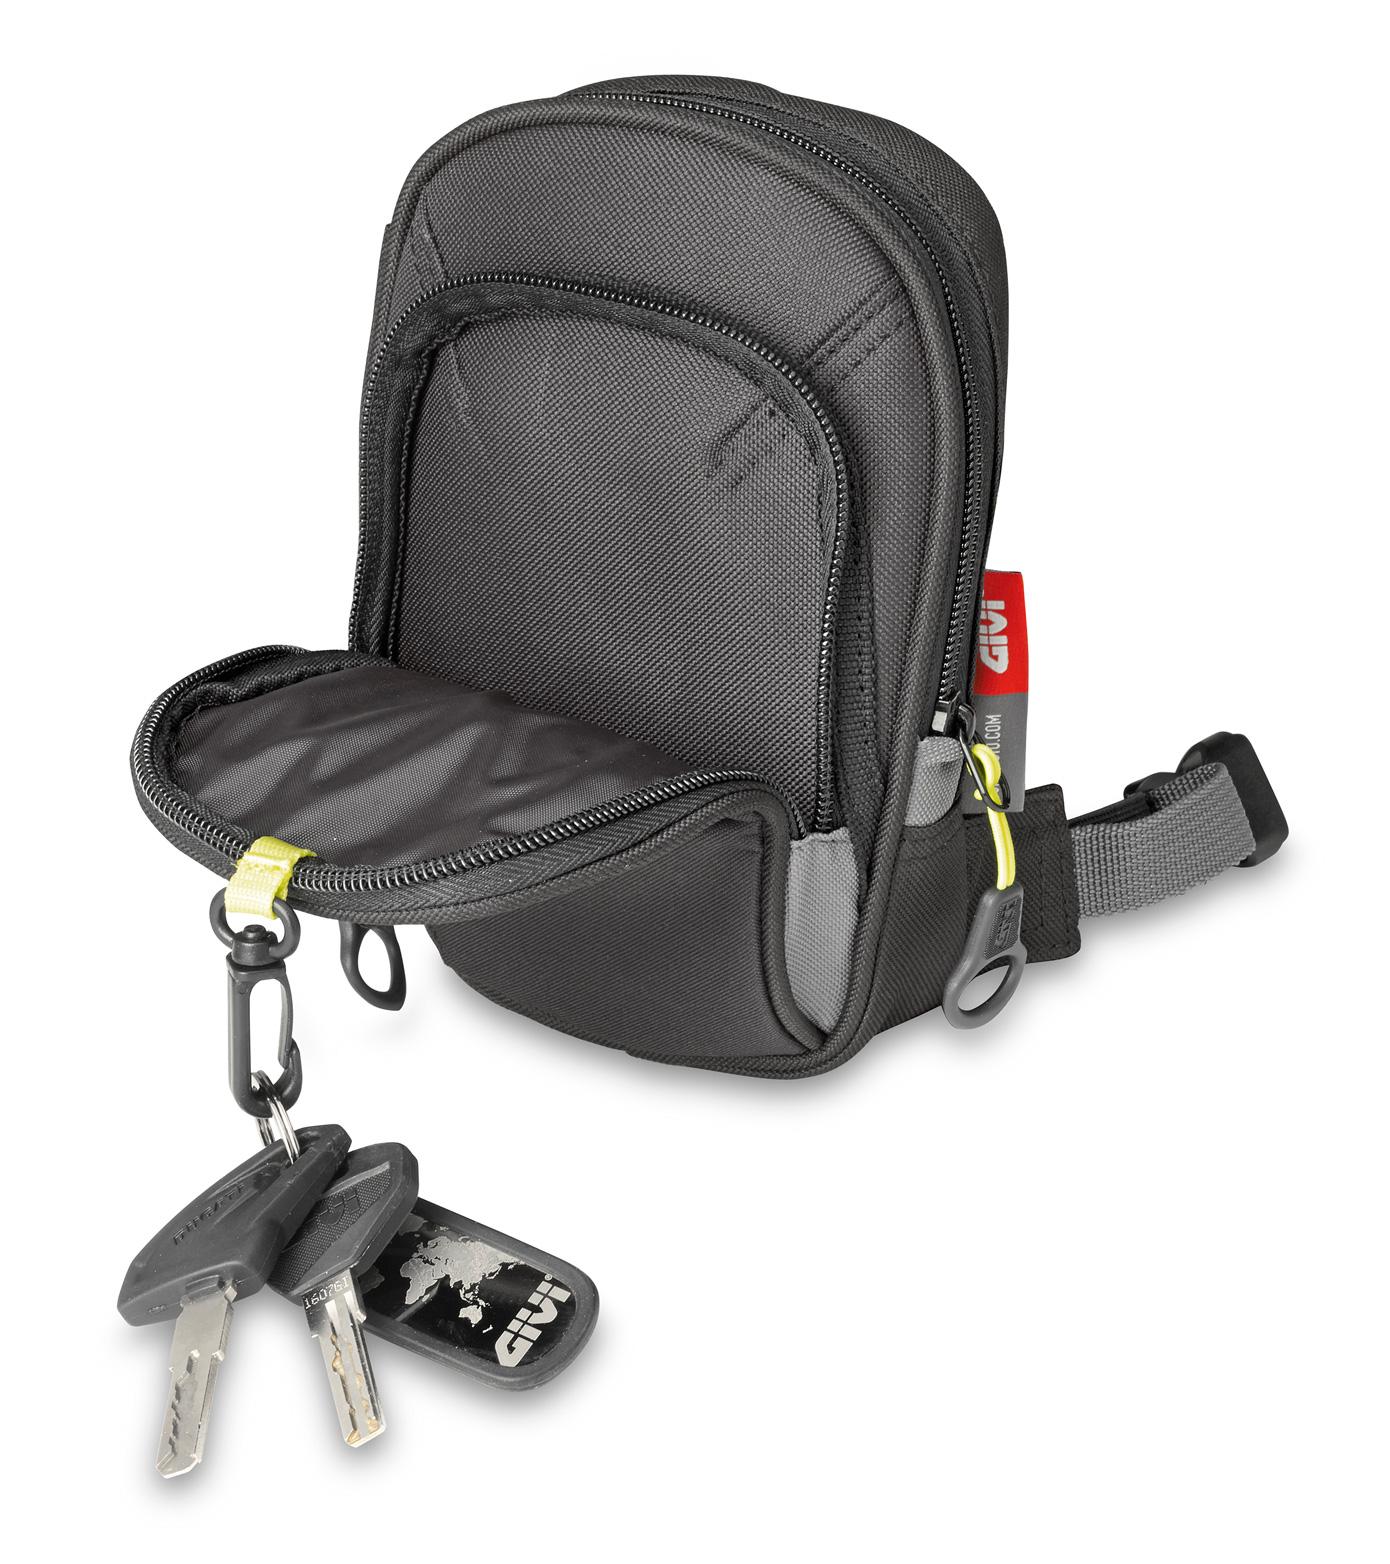 Beige Stitch Autoguru VW Jetta Vento GTI MK4 99-04 Manual Shift /& E-Brake Boot Set Real Leather Black